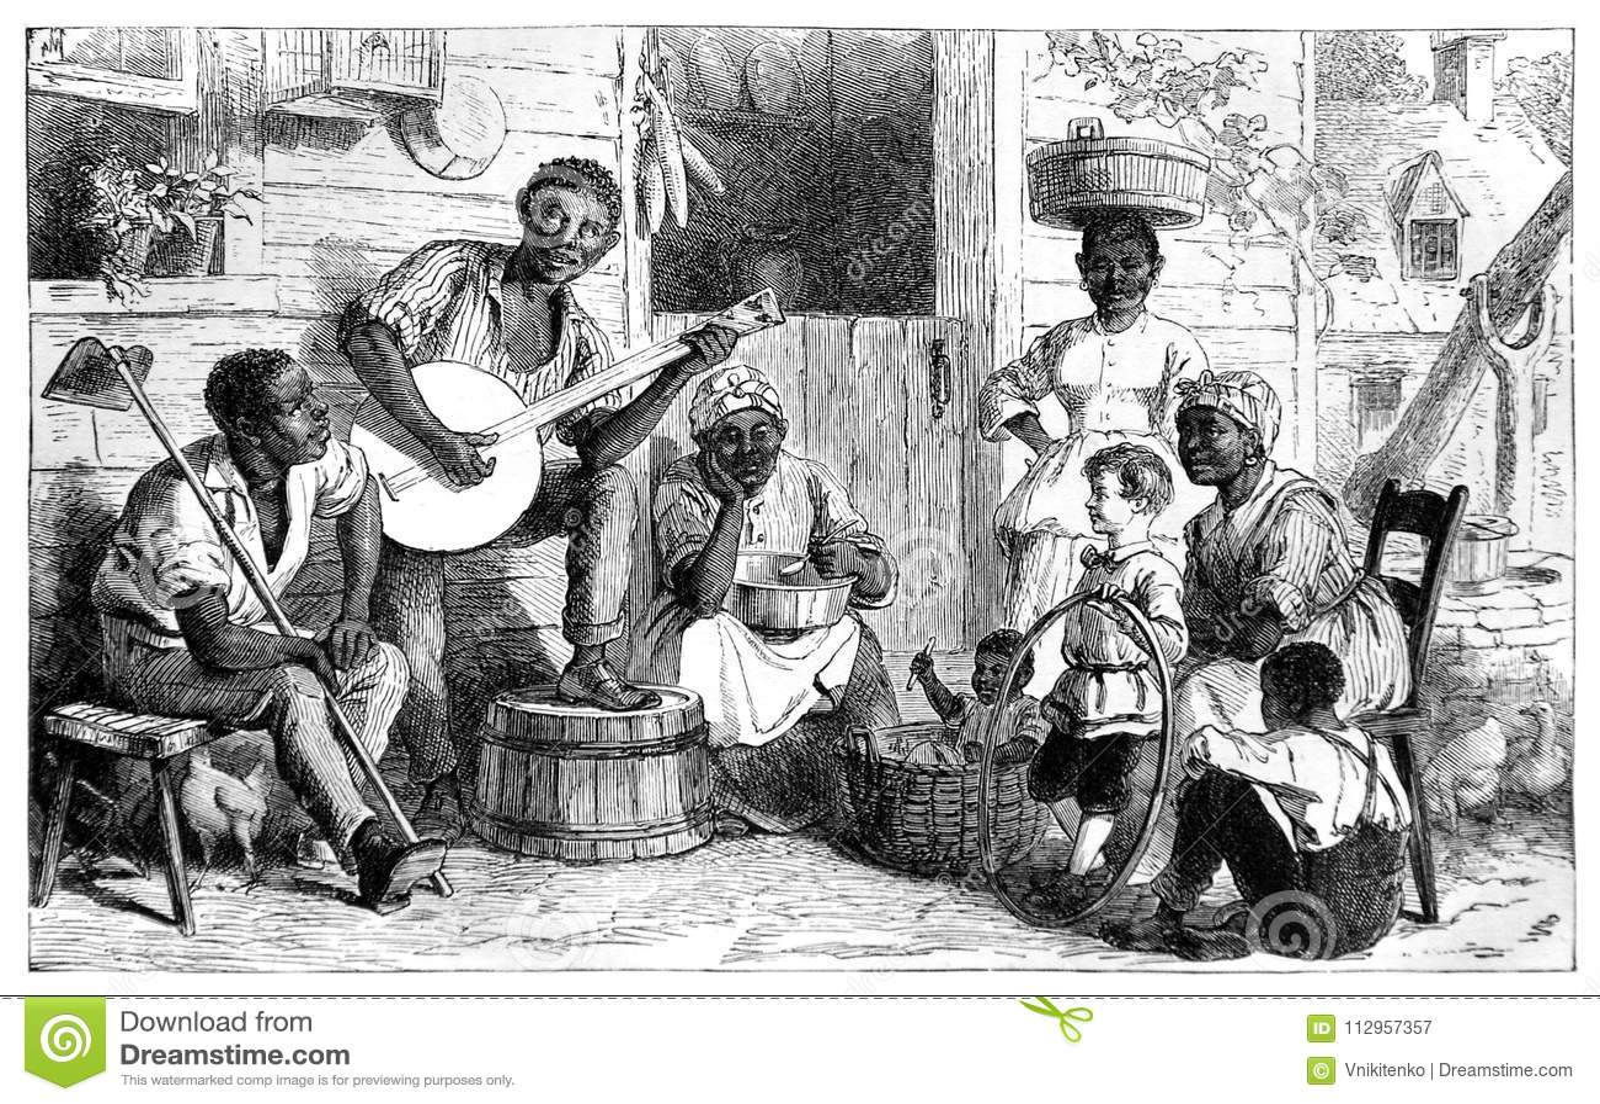 History and origins of jazz